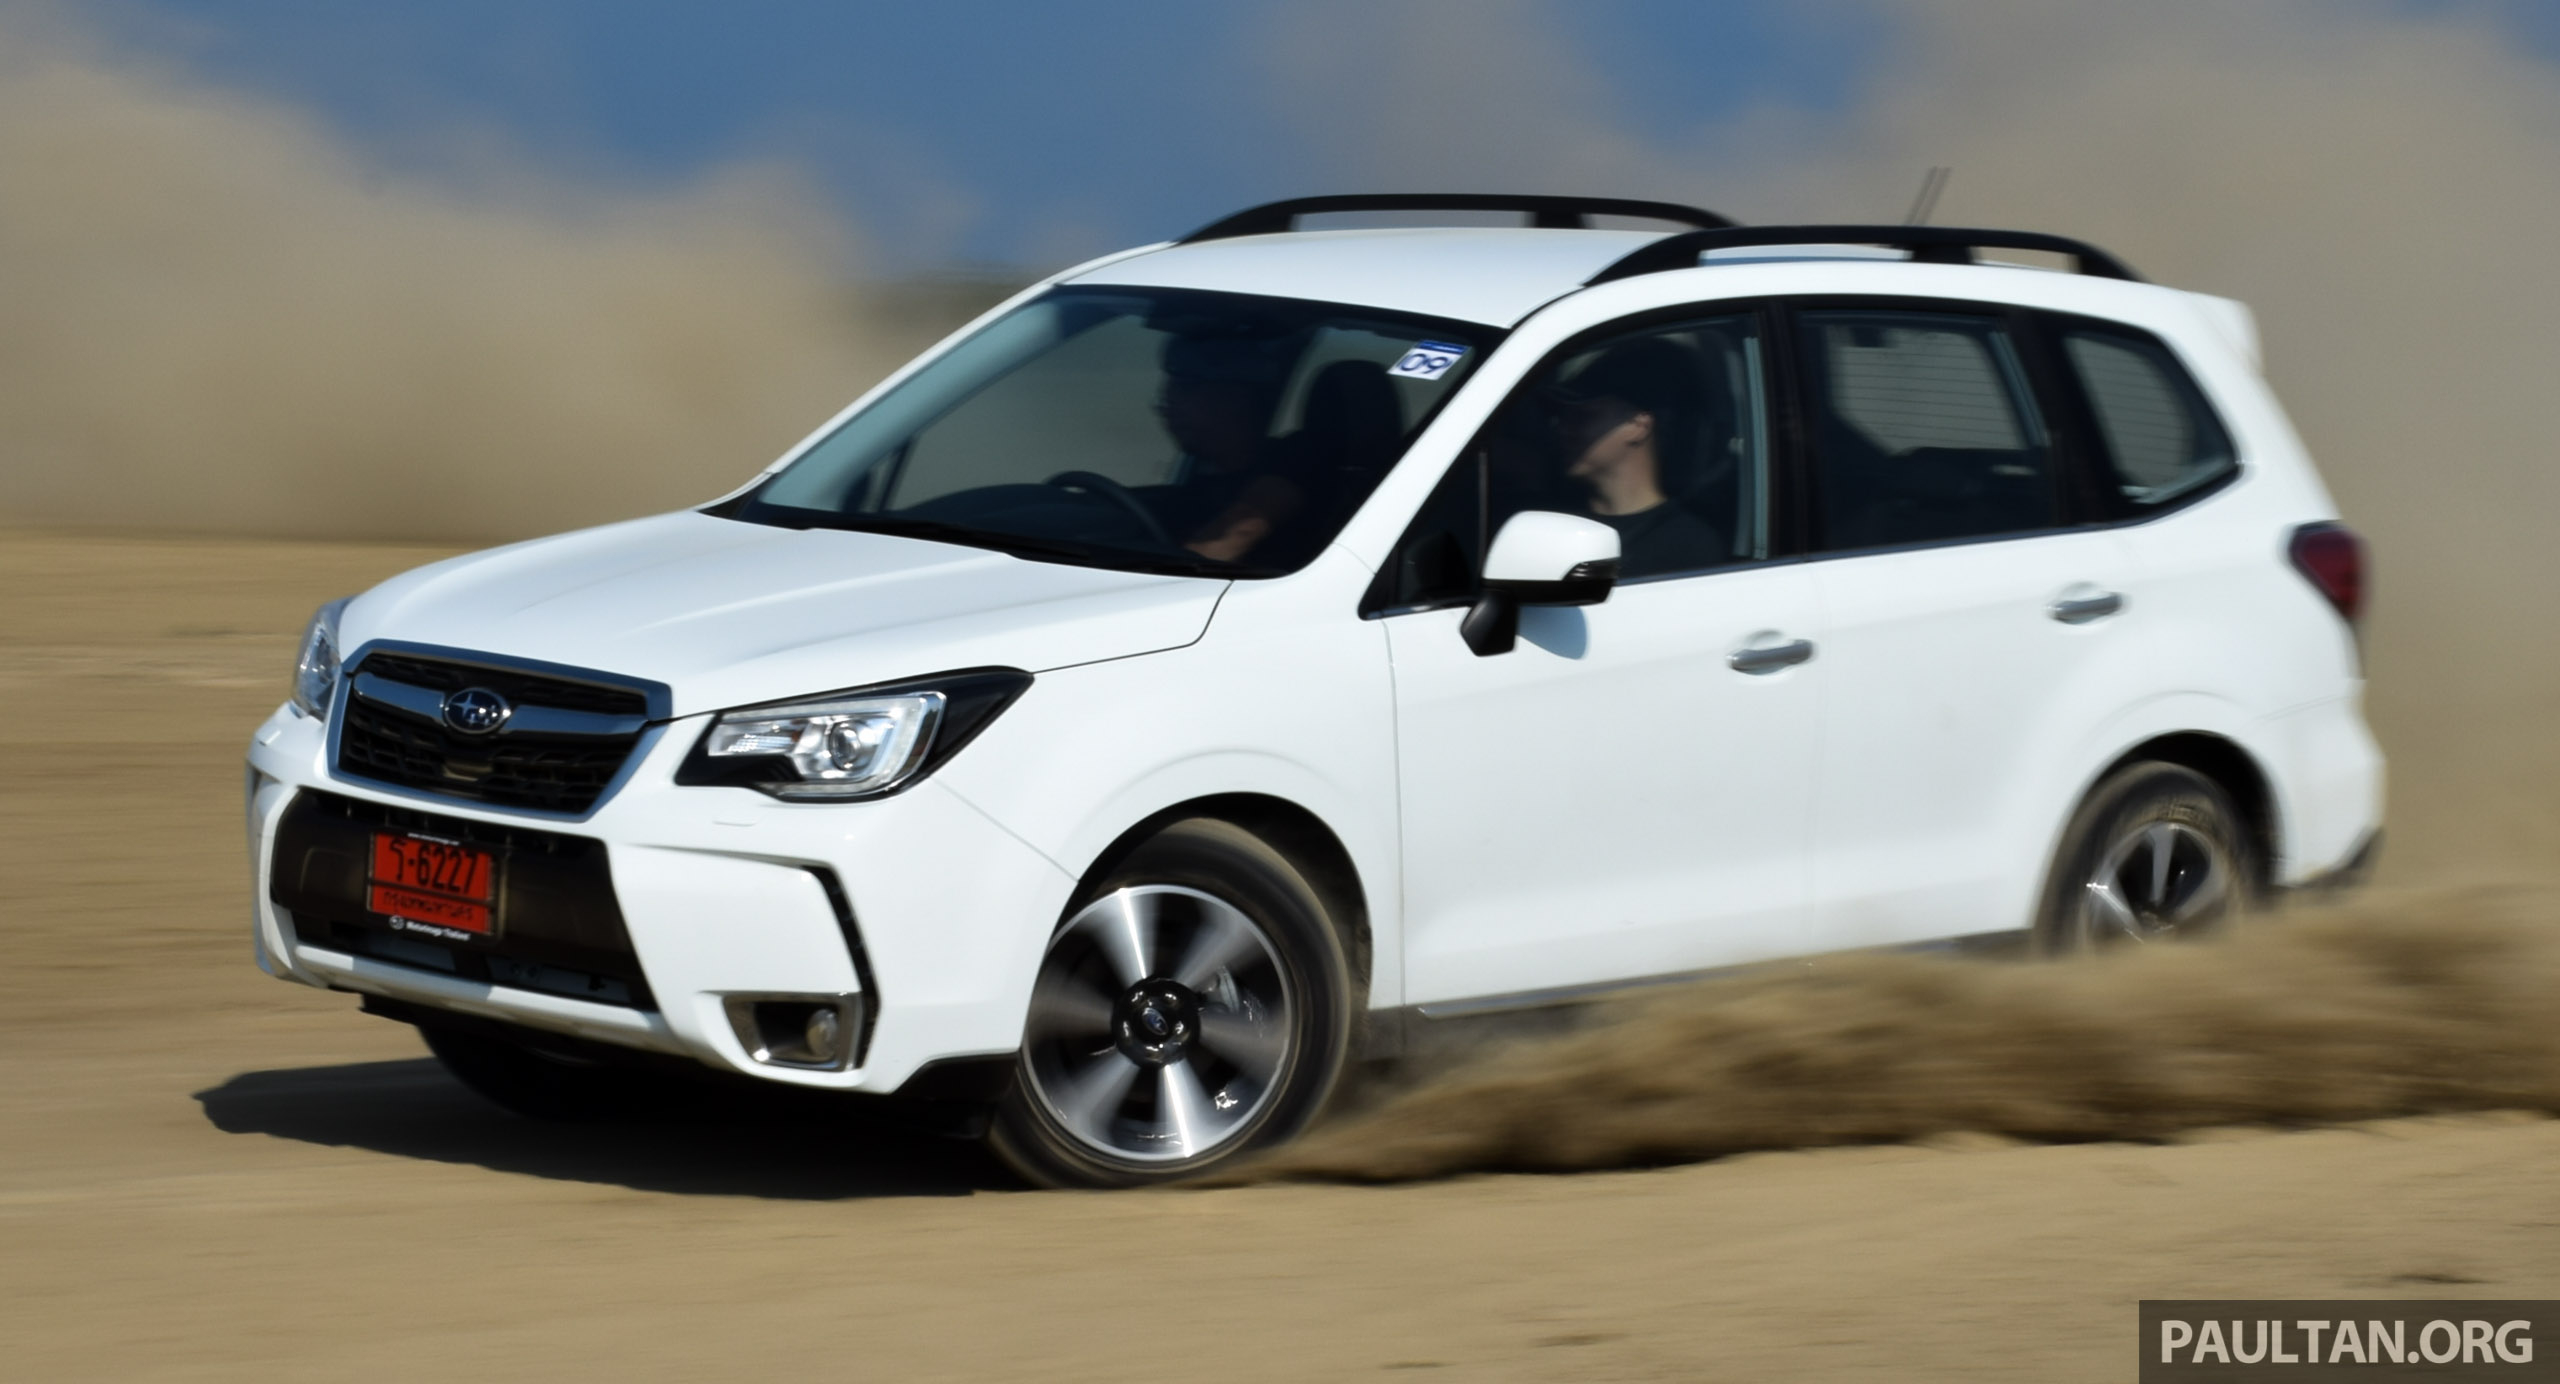 Subaru Forester 2.0 2017 >> DRIVEN: Subaru Forester 2.0i-P – a worthy alternative? Image 480291